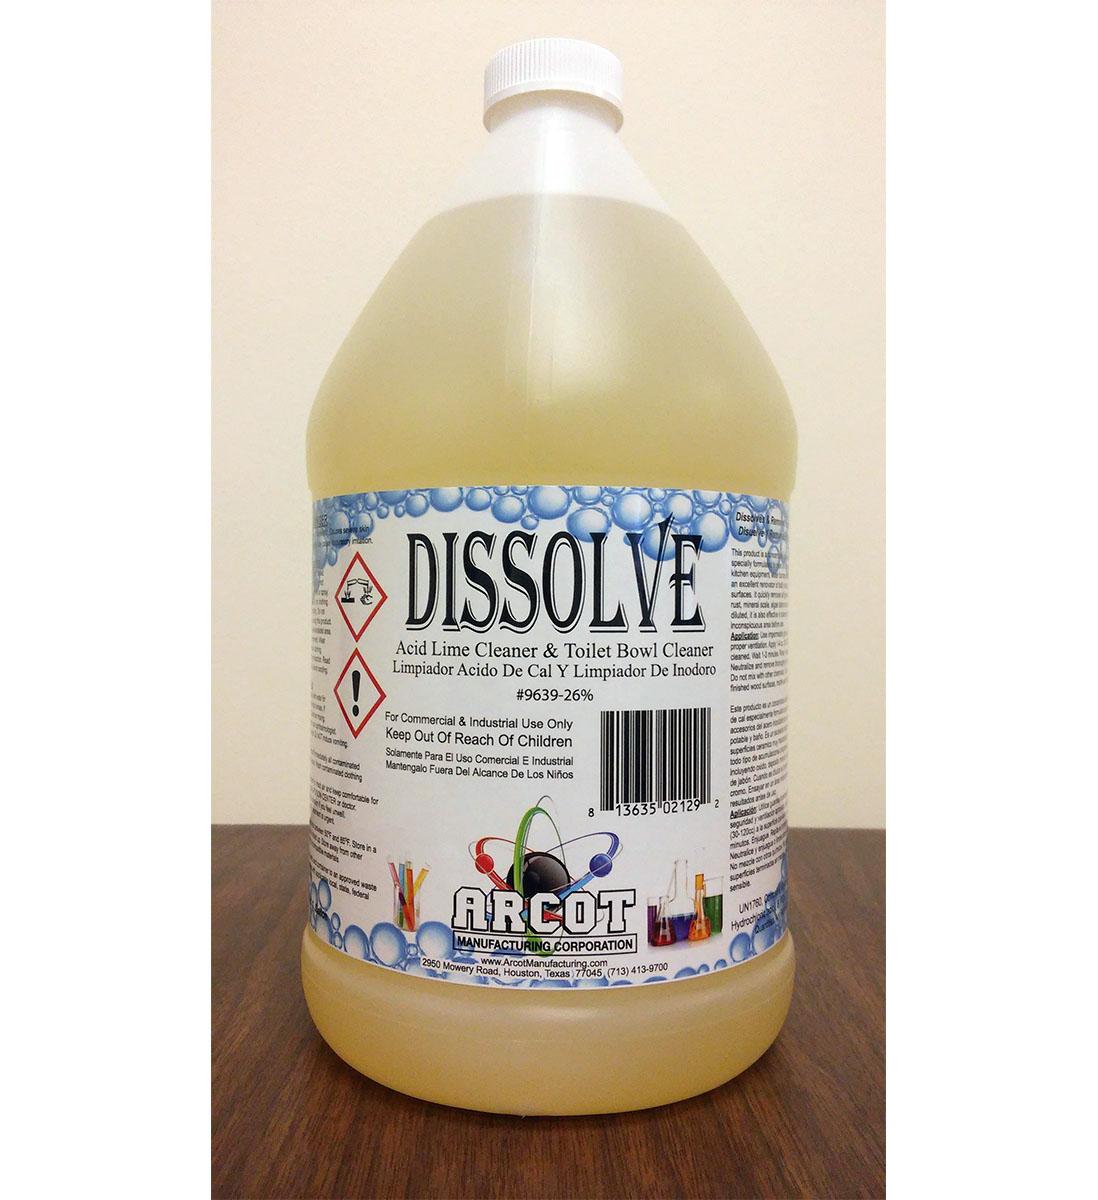 Dissolve (26%)